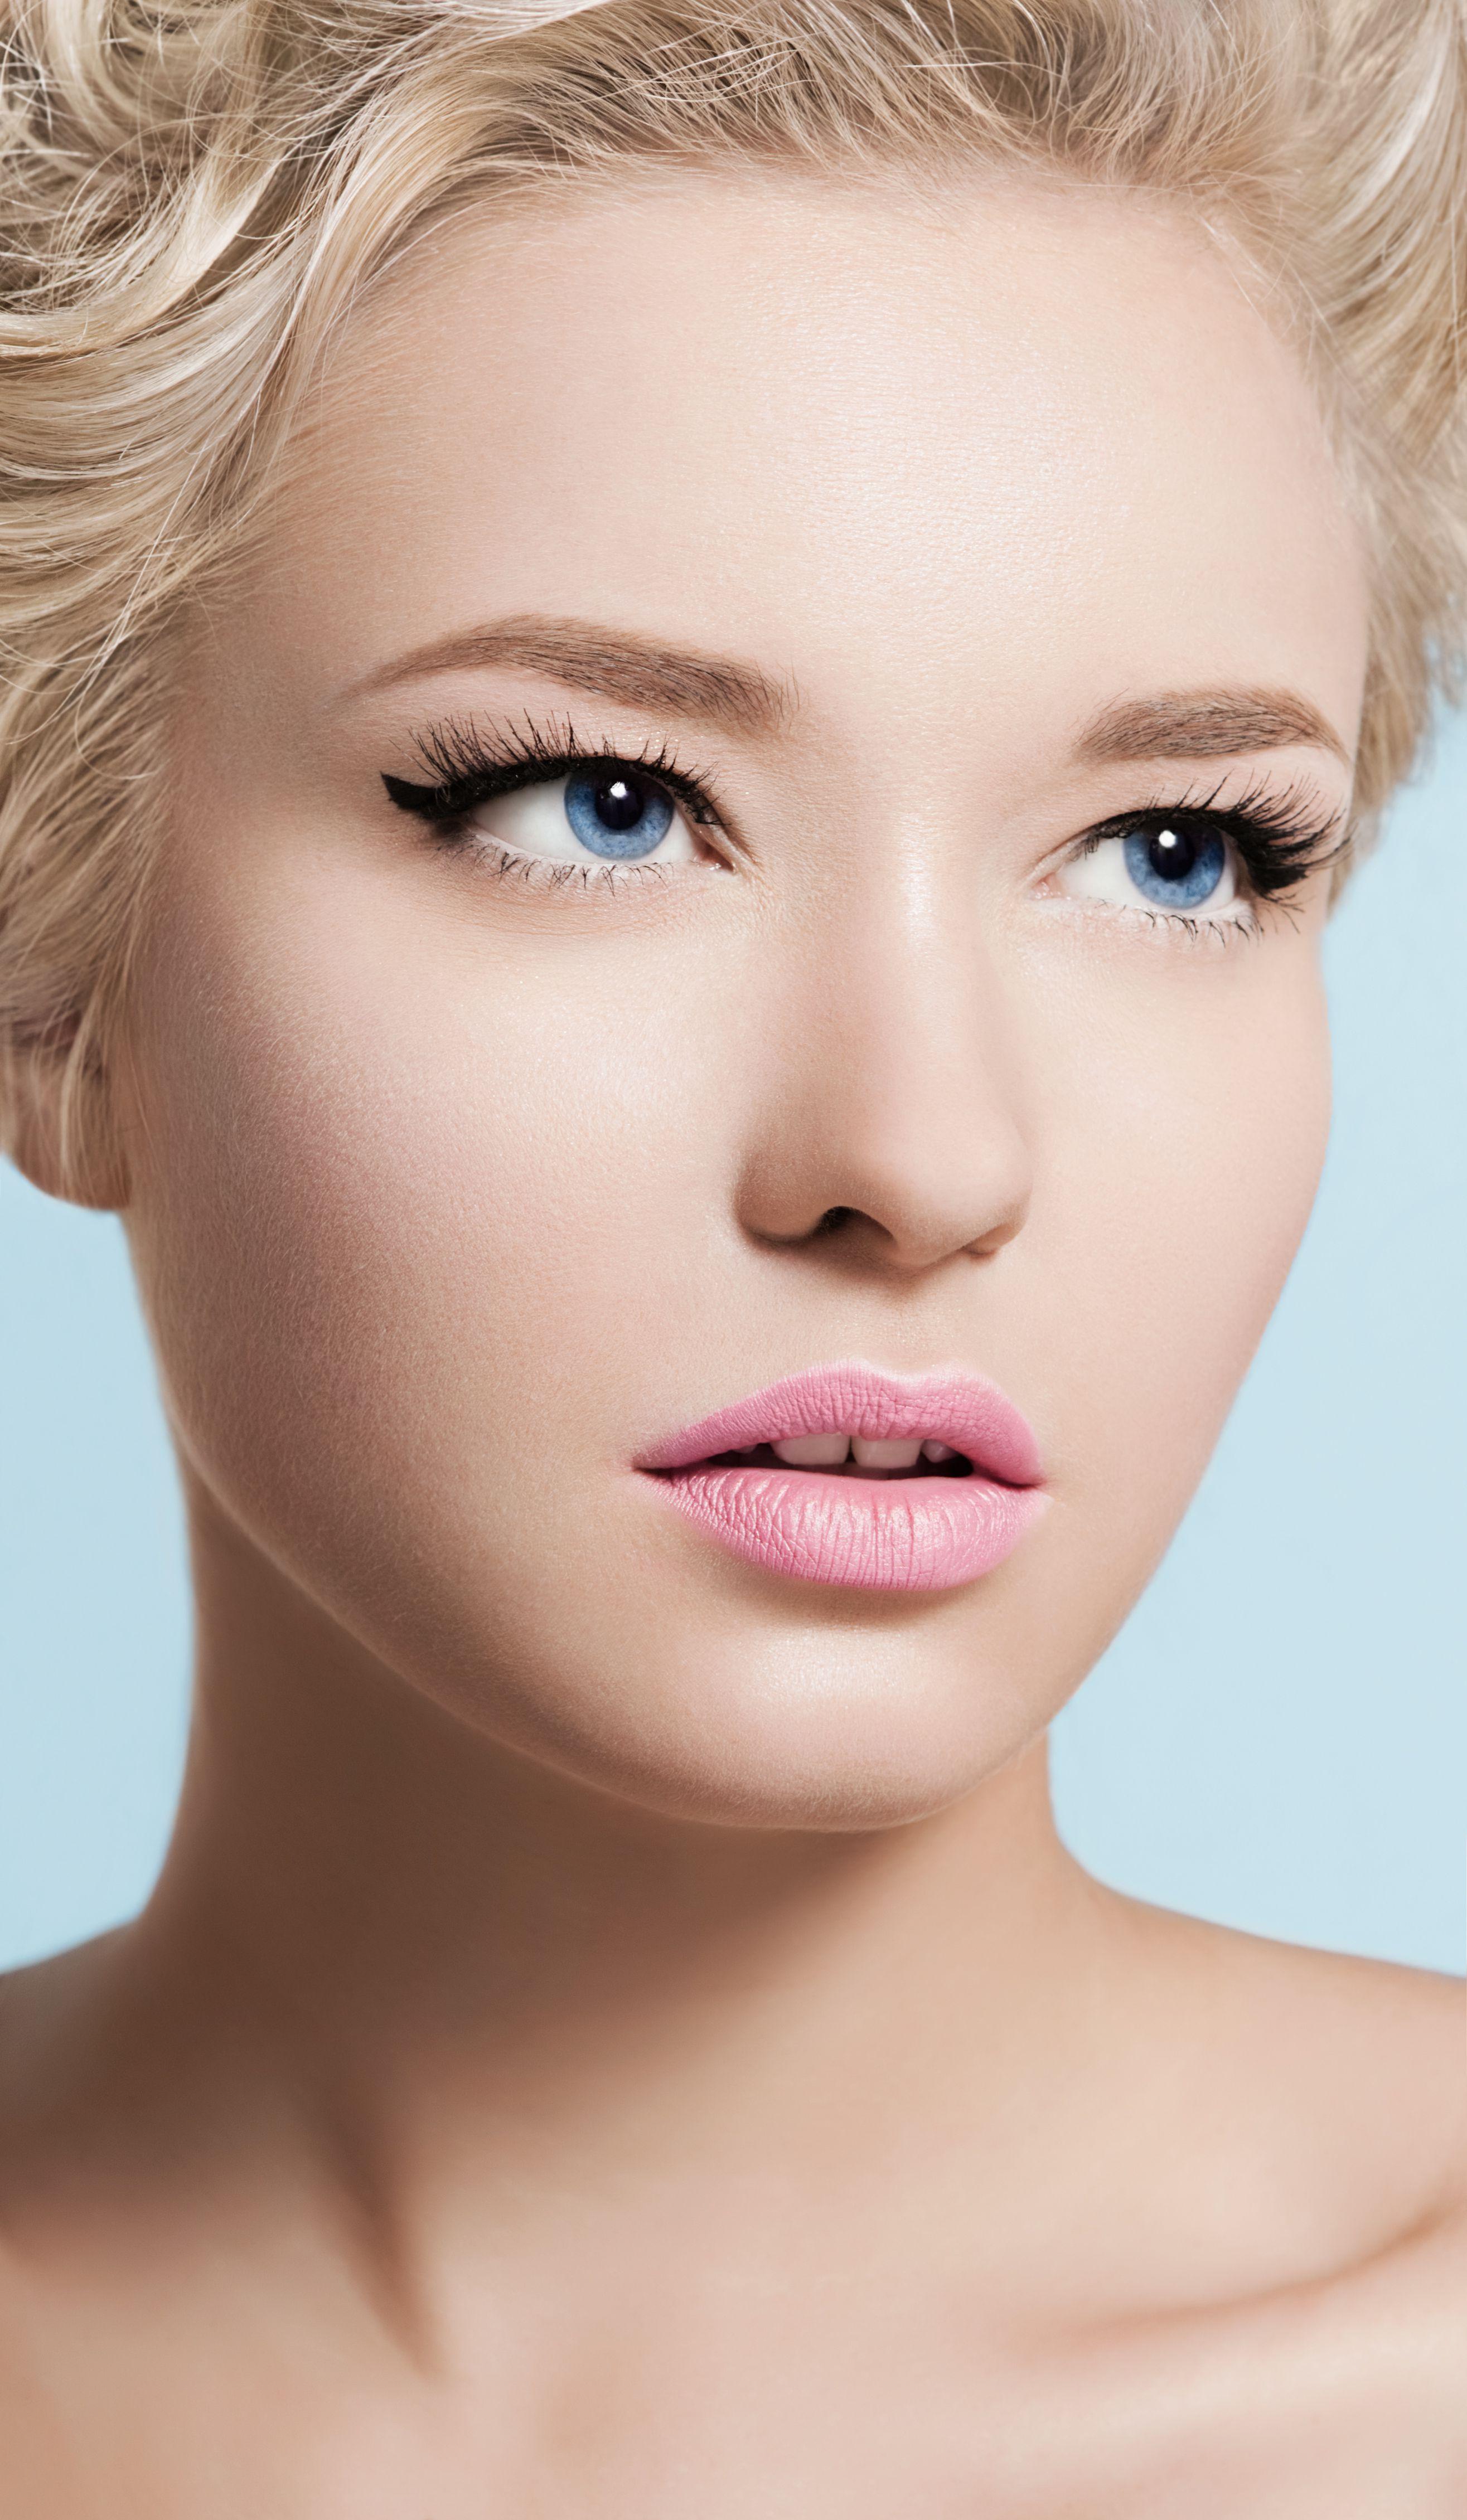 how to trim bushy eyebrows. how to stimulate growth and get thicker brows trim bushy eyebrows